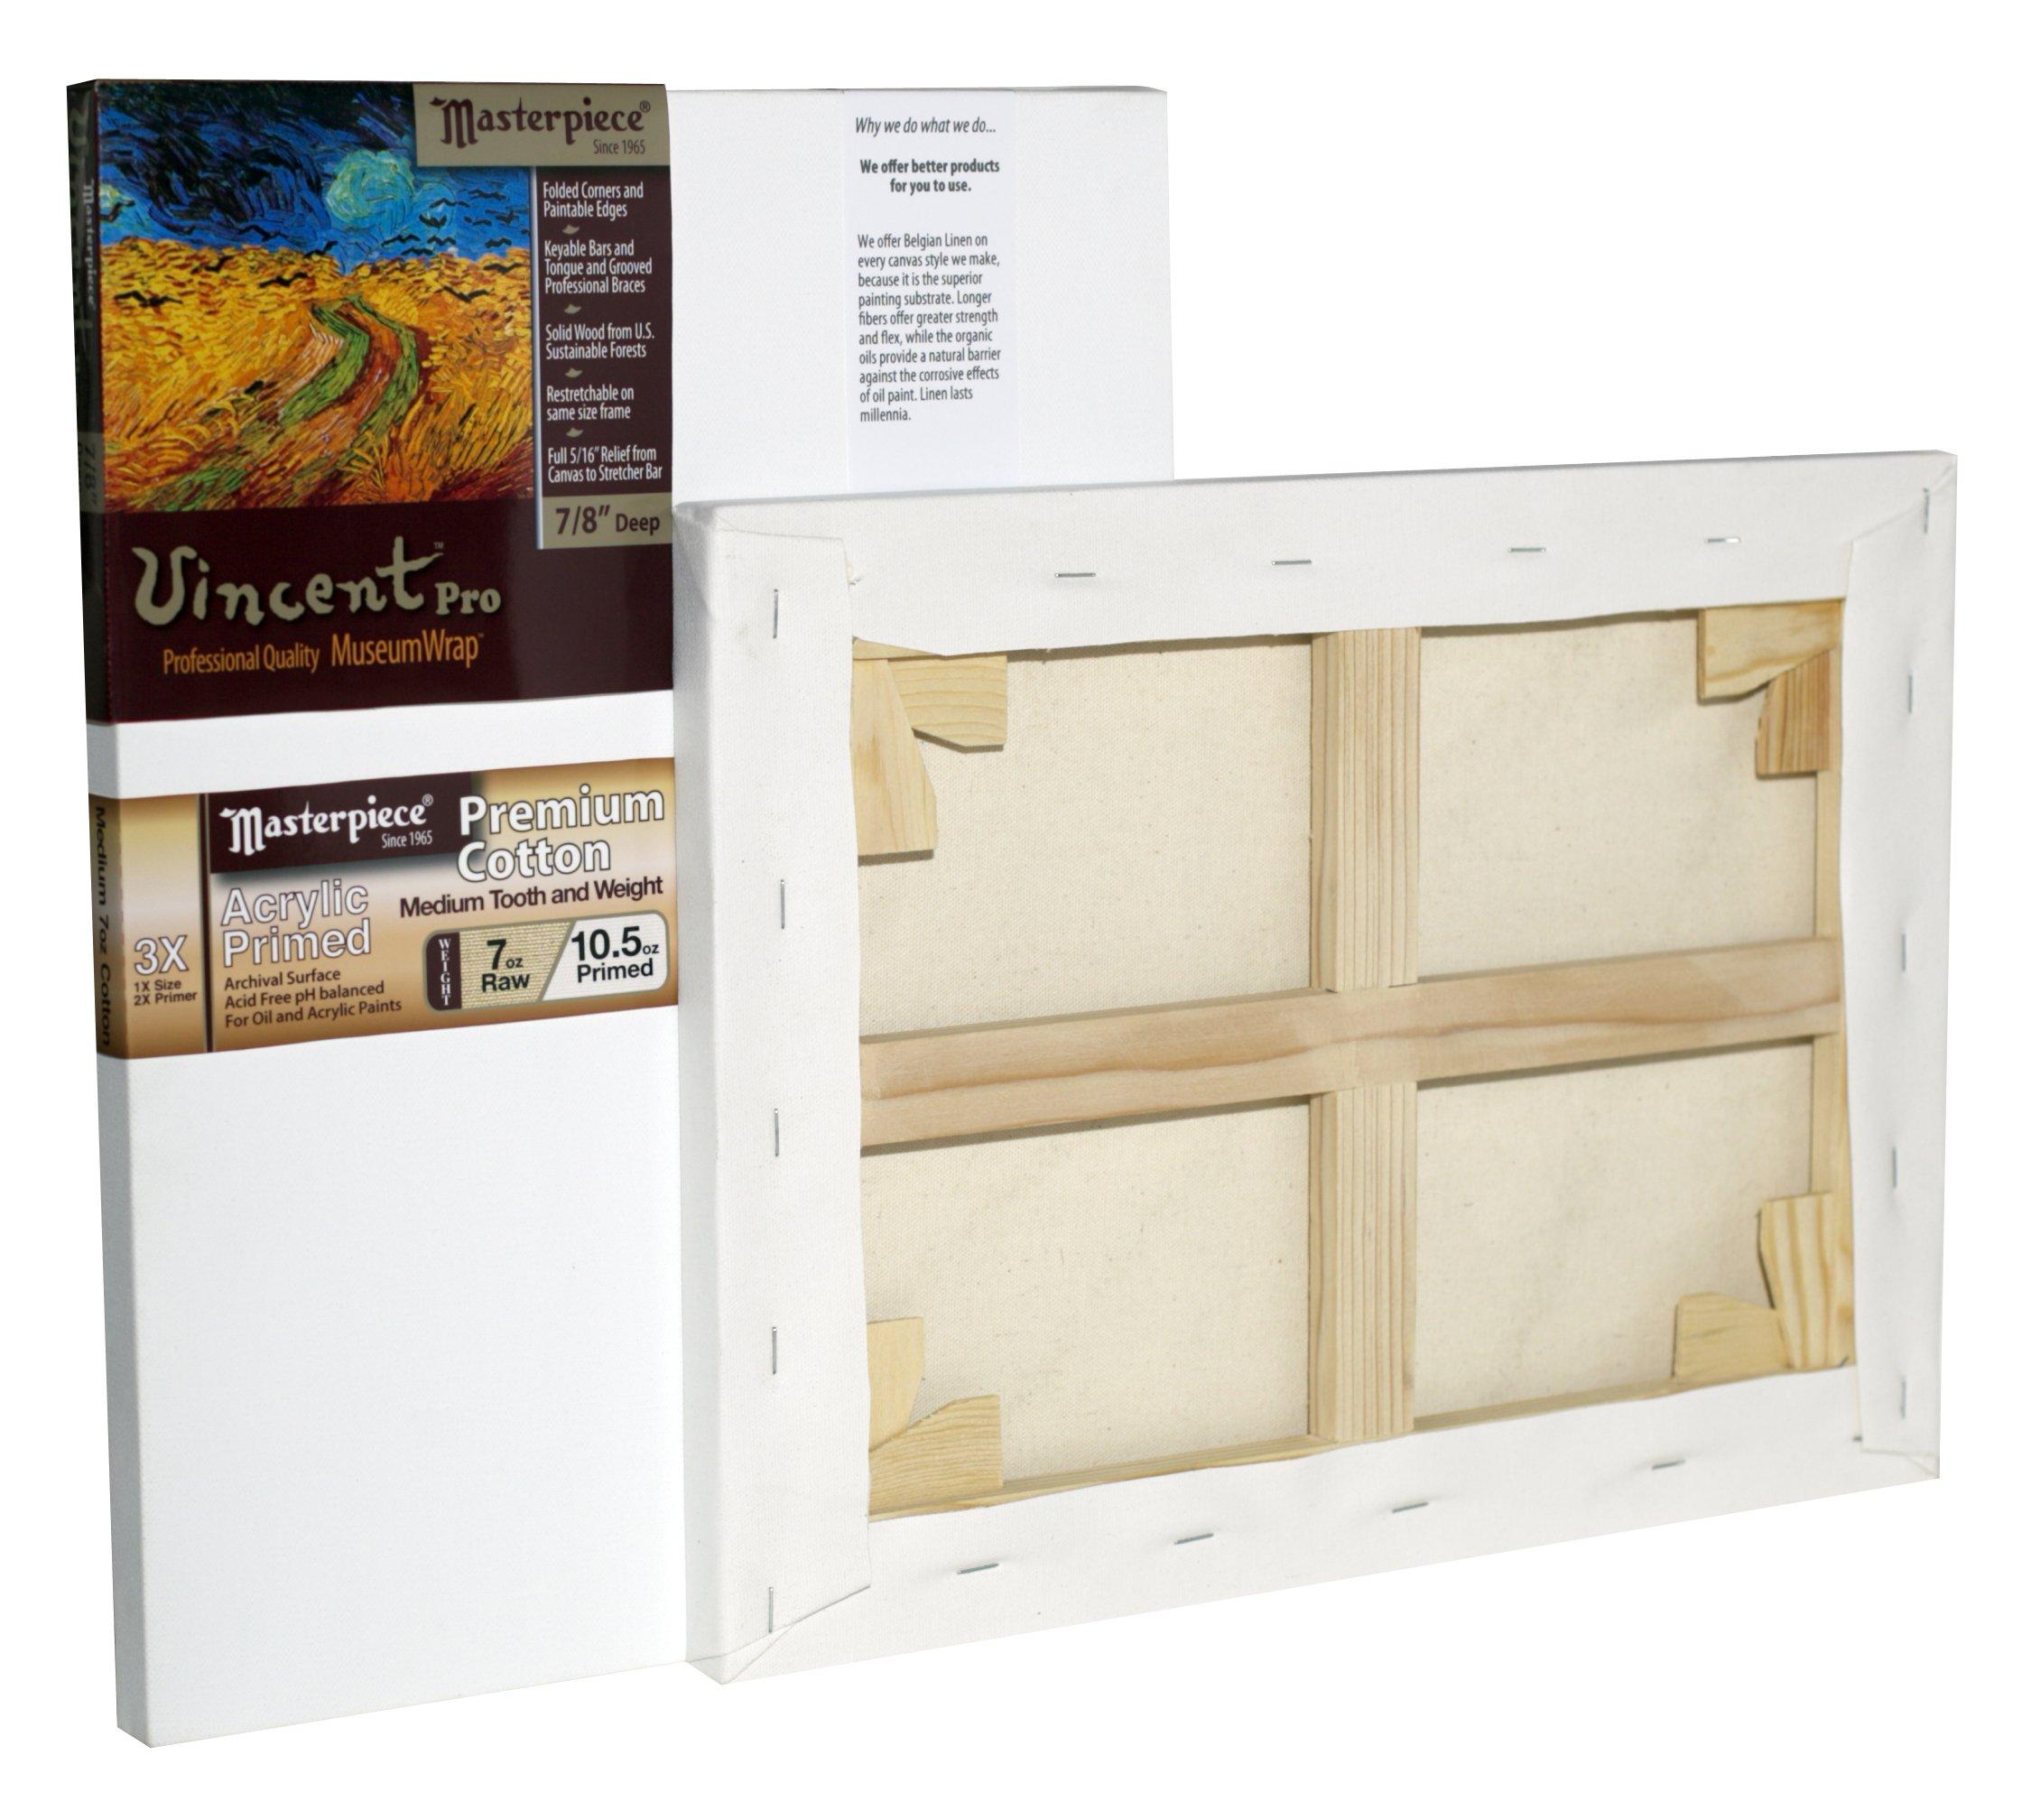 Masterpiece Artist Canvas 41033 Vincent PRO 7/8'' Deep, 12'' x 36'', Cotton 10.5oz - 3X - Monterey Most Popular